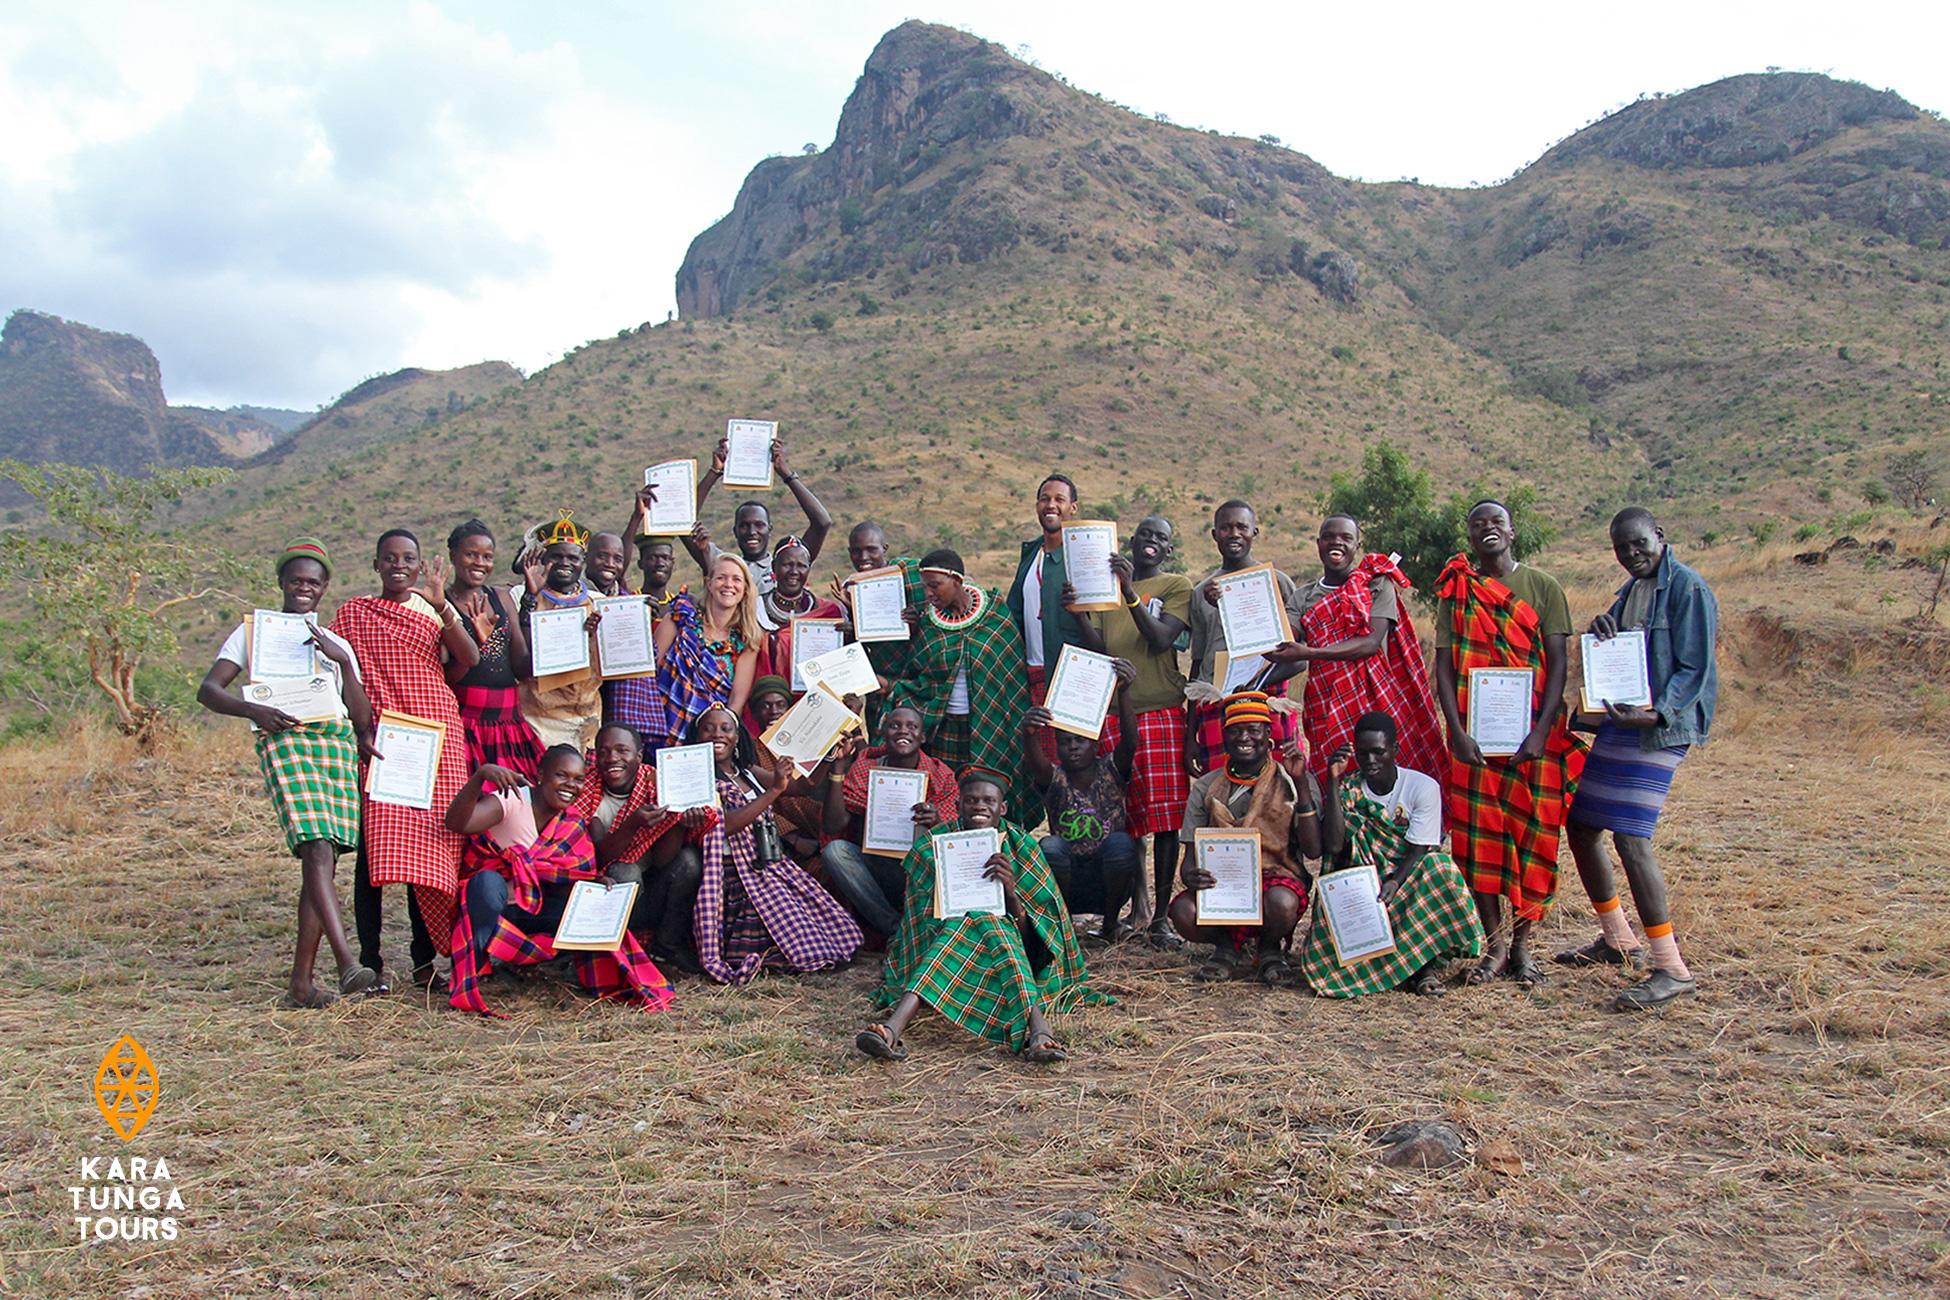 Kara-Tunga-Karamoja-Tours-Travel-Safari-Guides-Gradutation-USAGA